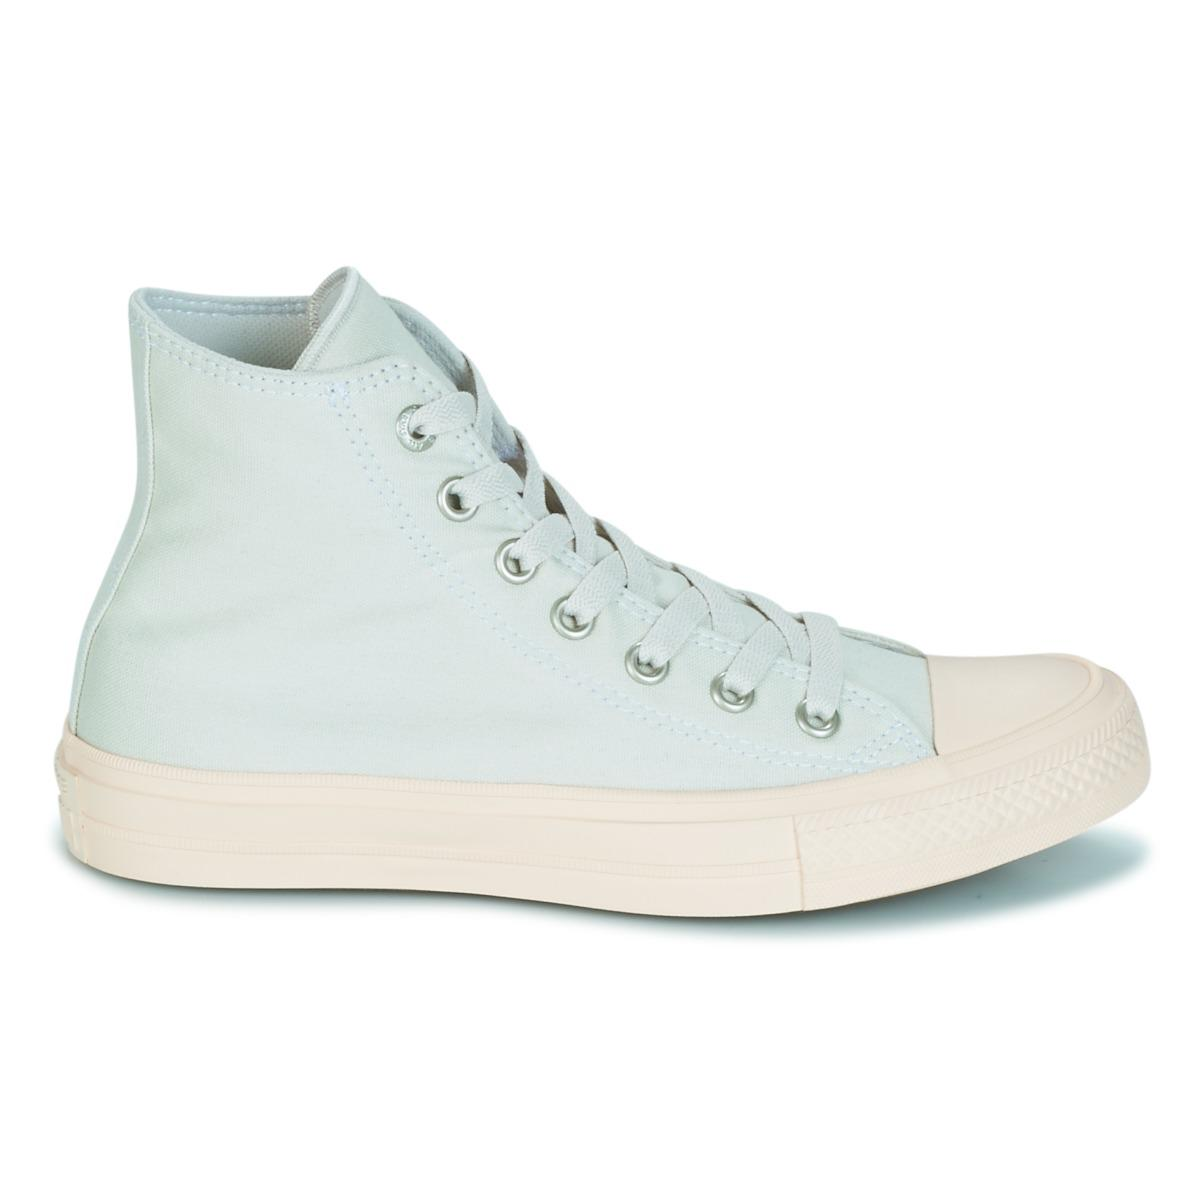 a13d1a3b80c3 Converse Chuck Taylor All Star Ii Shield Canvas Hi Women s Shoes ...